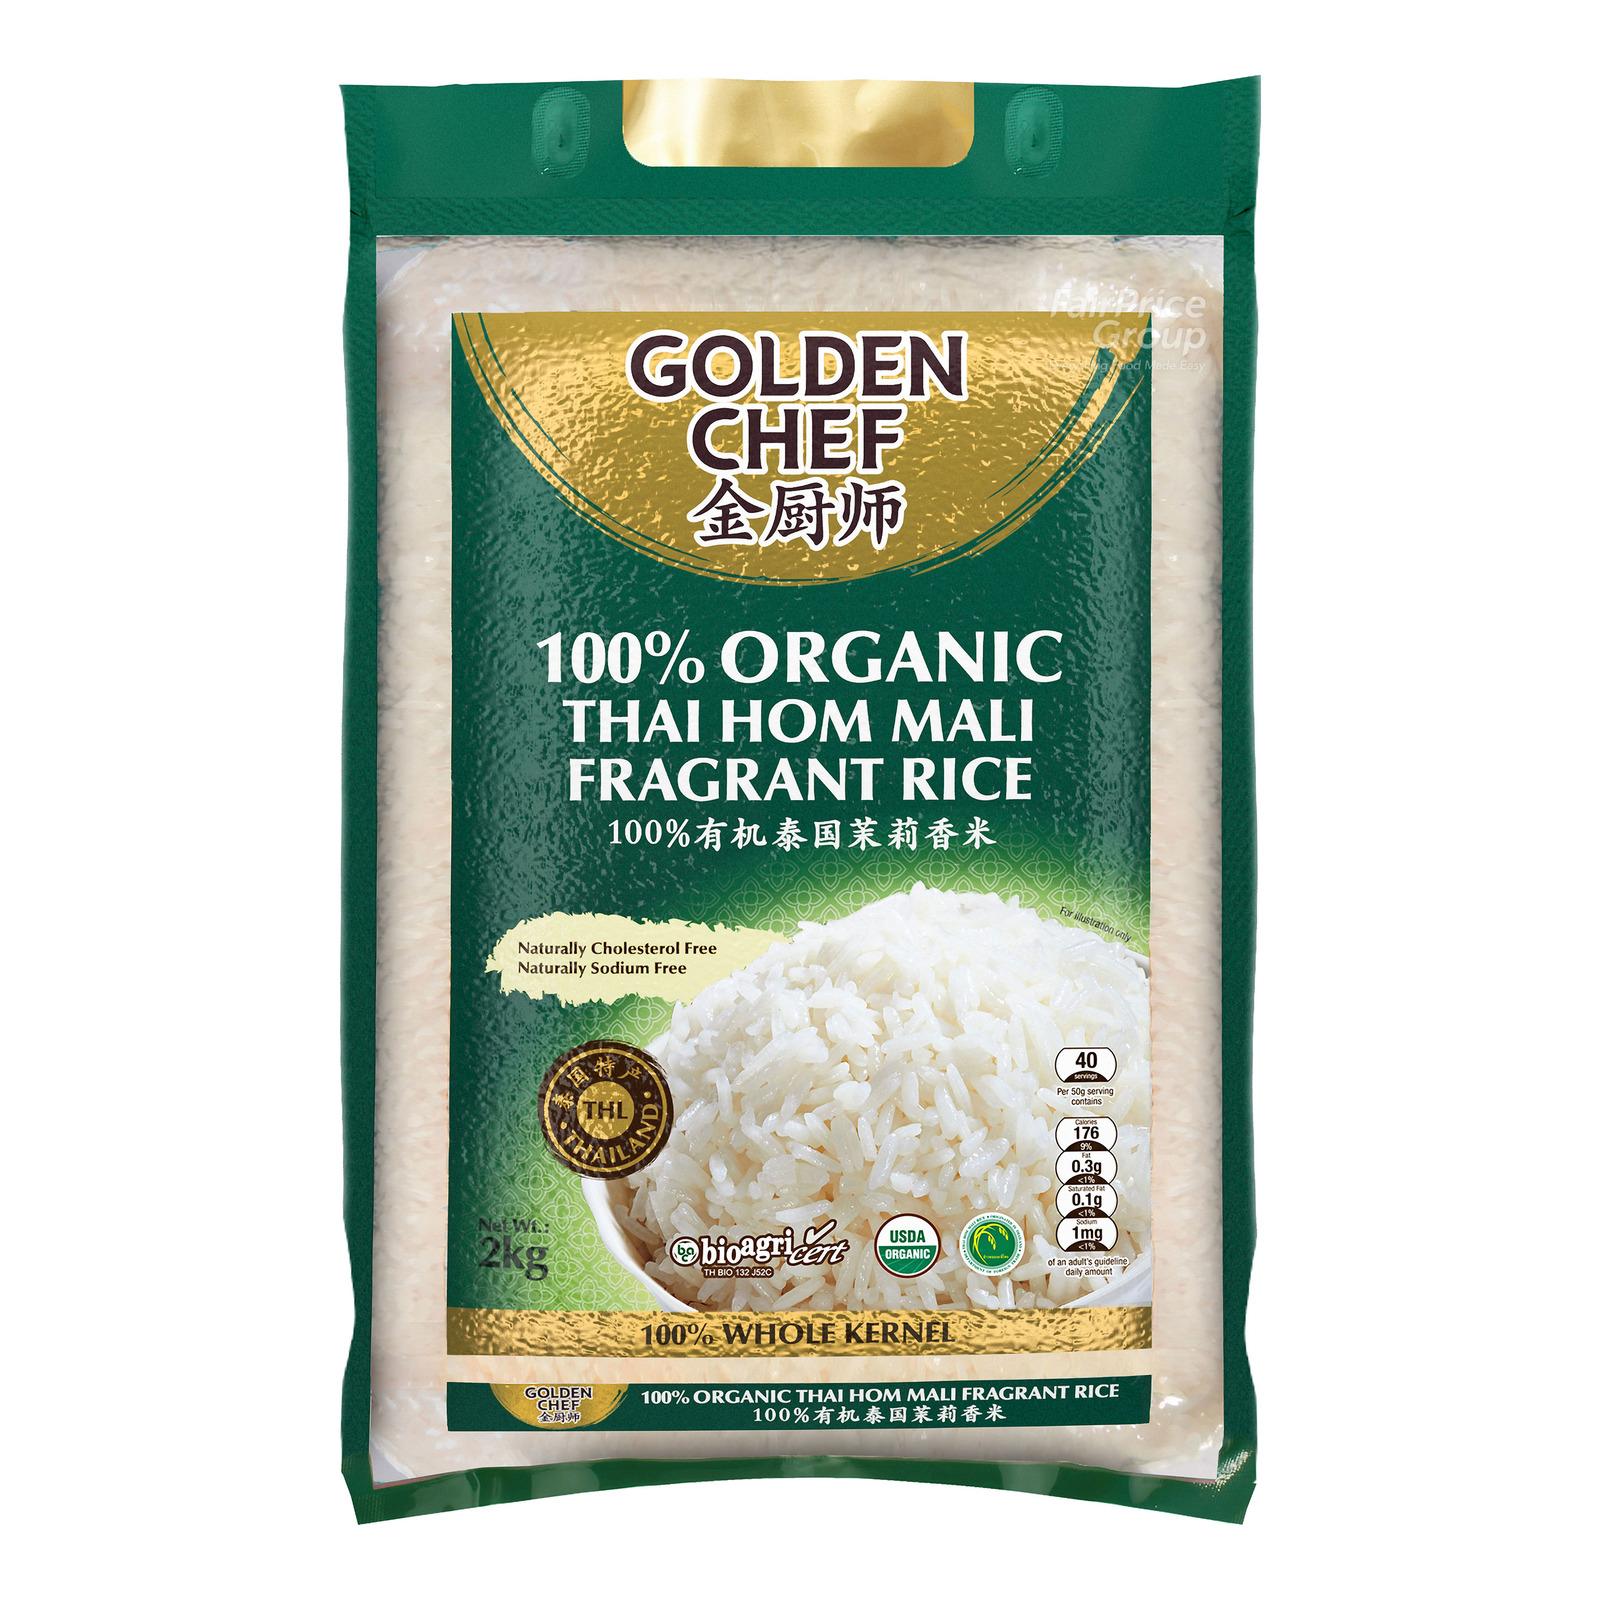 Golden Chef 100% Organic Thai Hom Mail Fragrant Rice